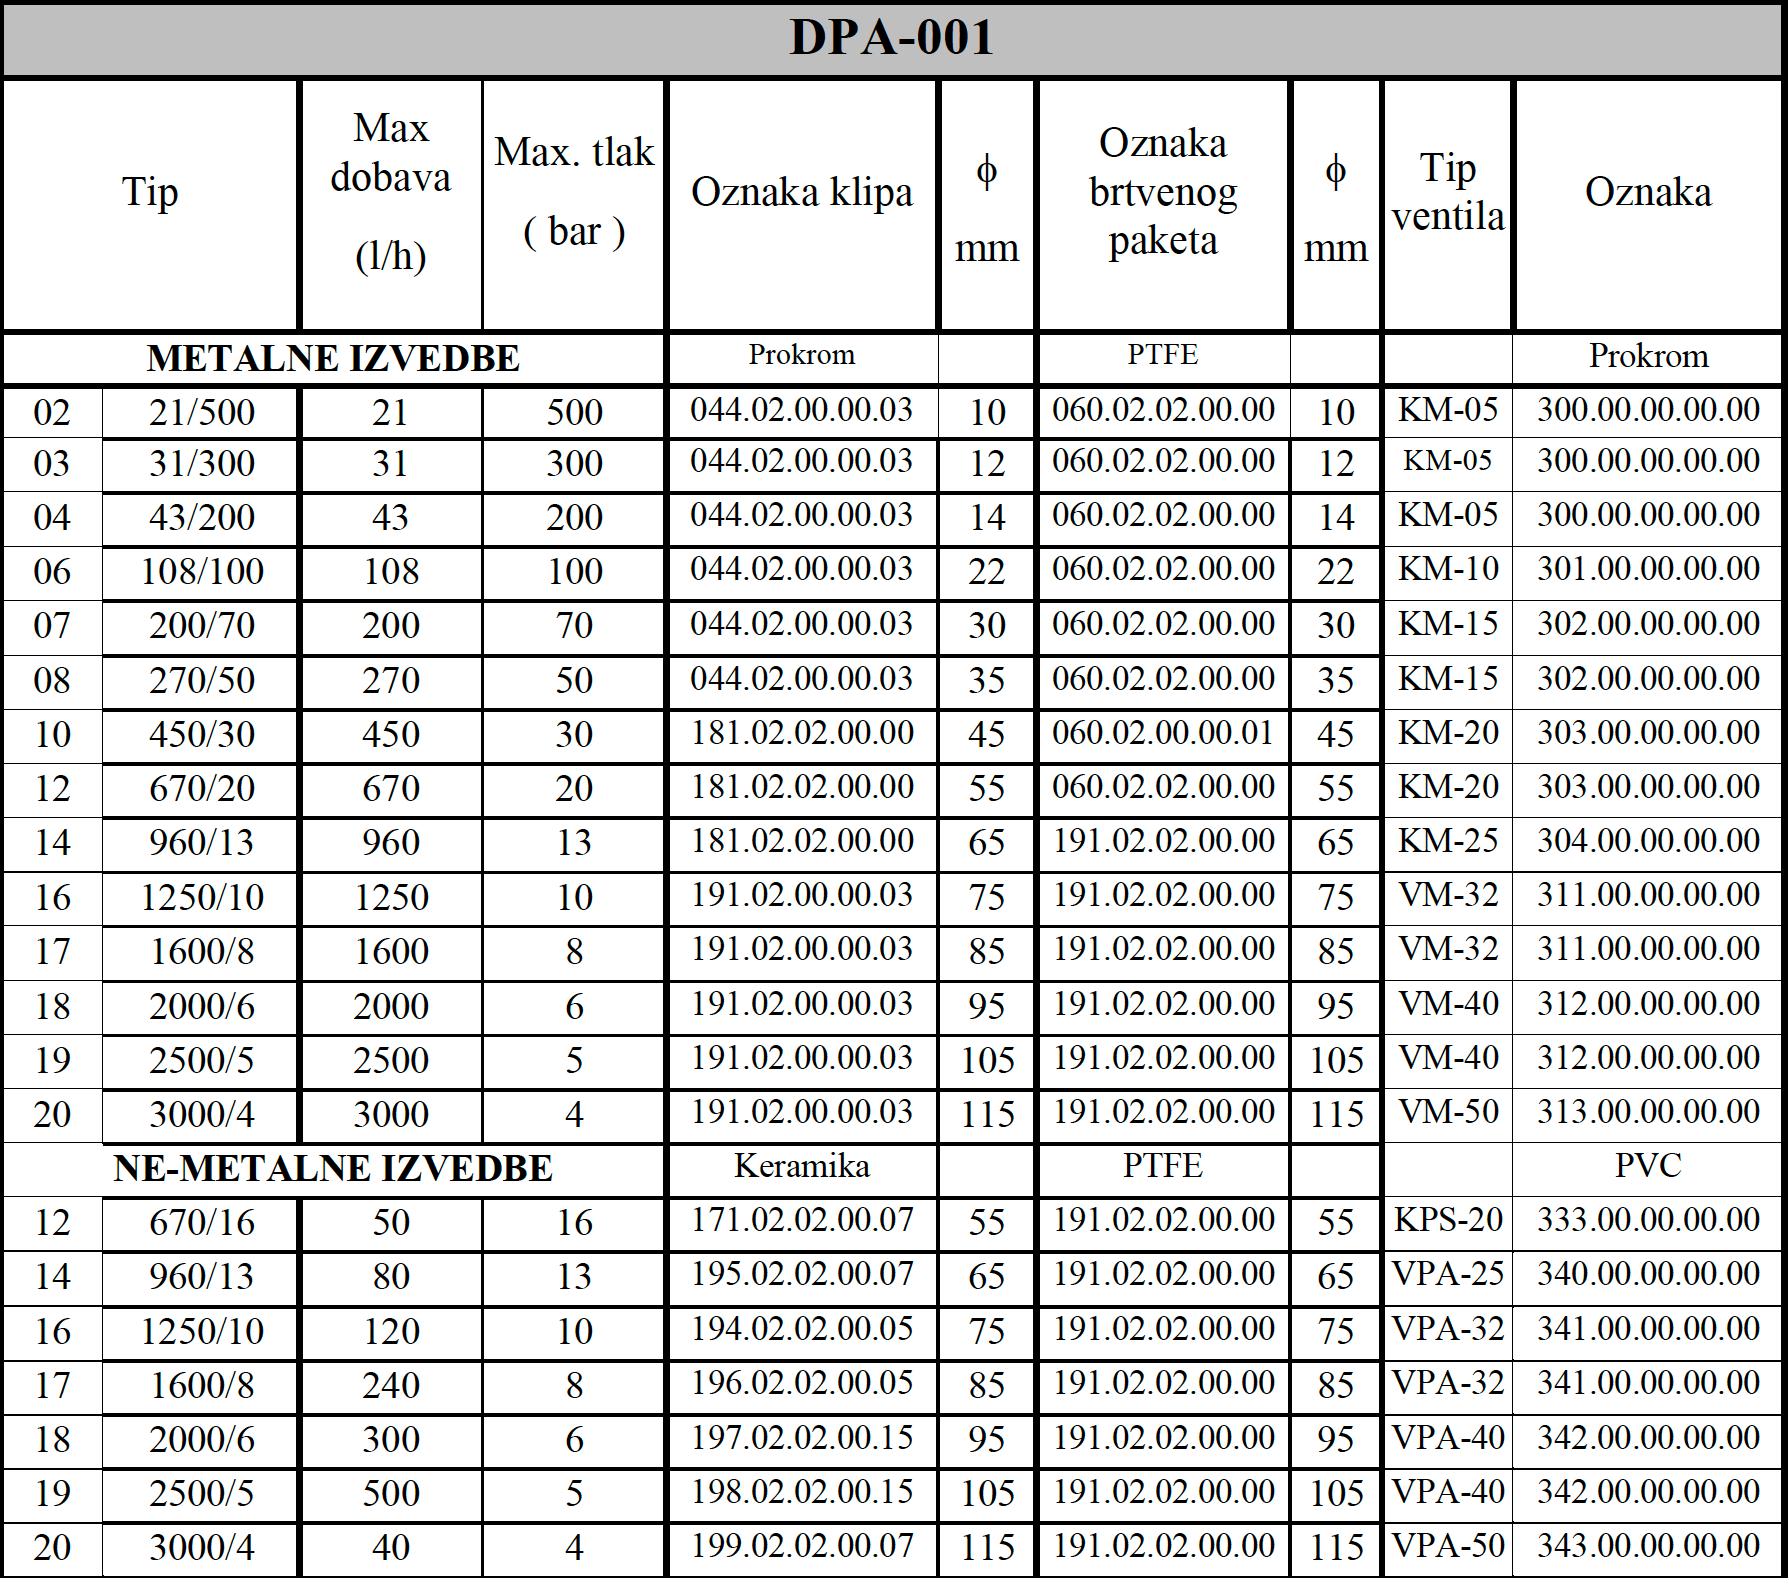 DPA 001 tablica 1